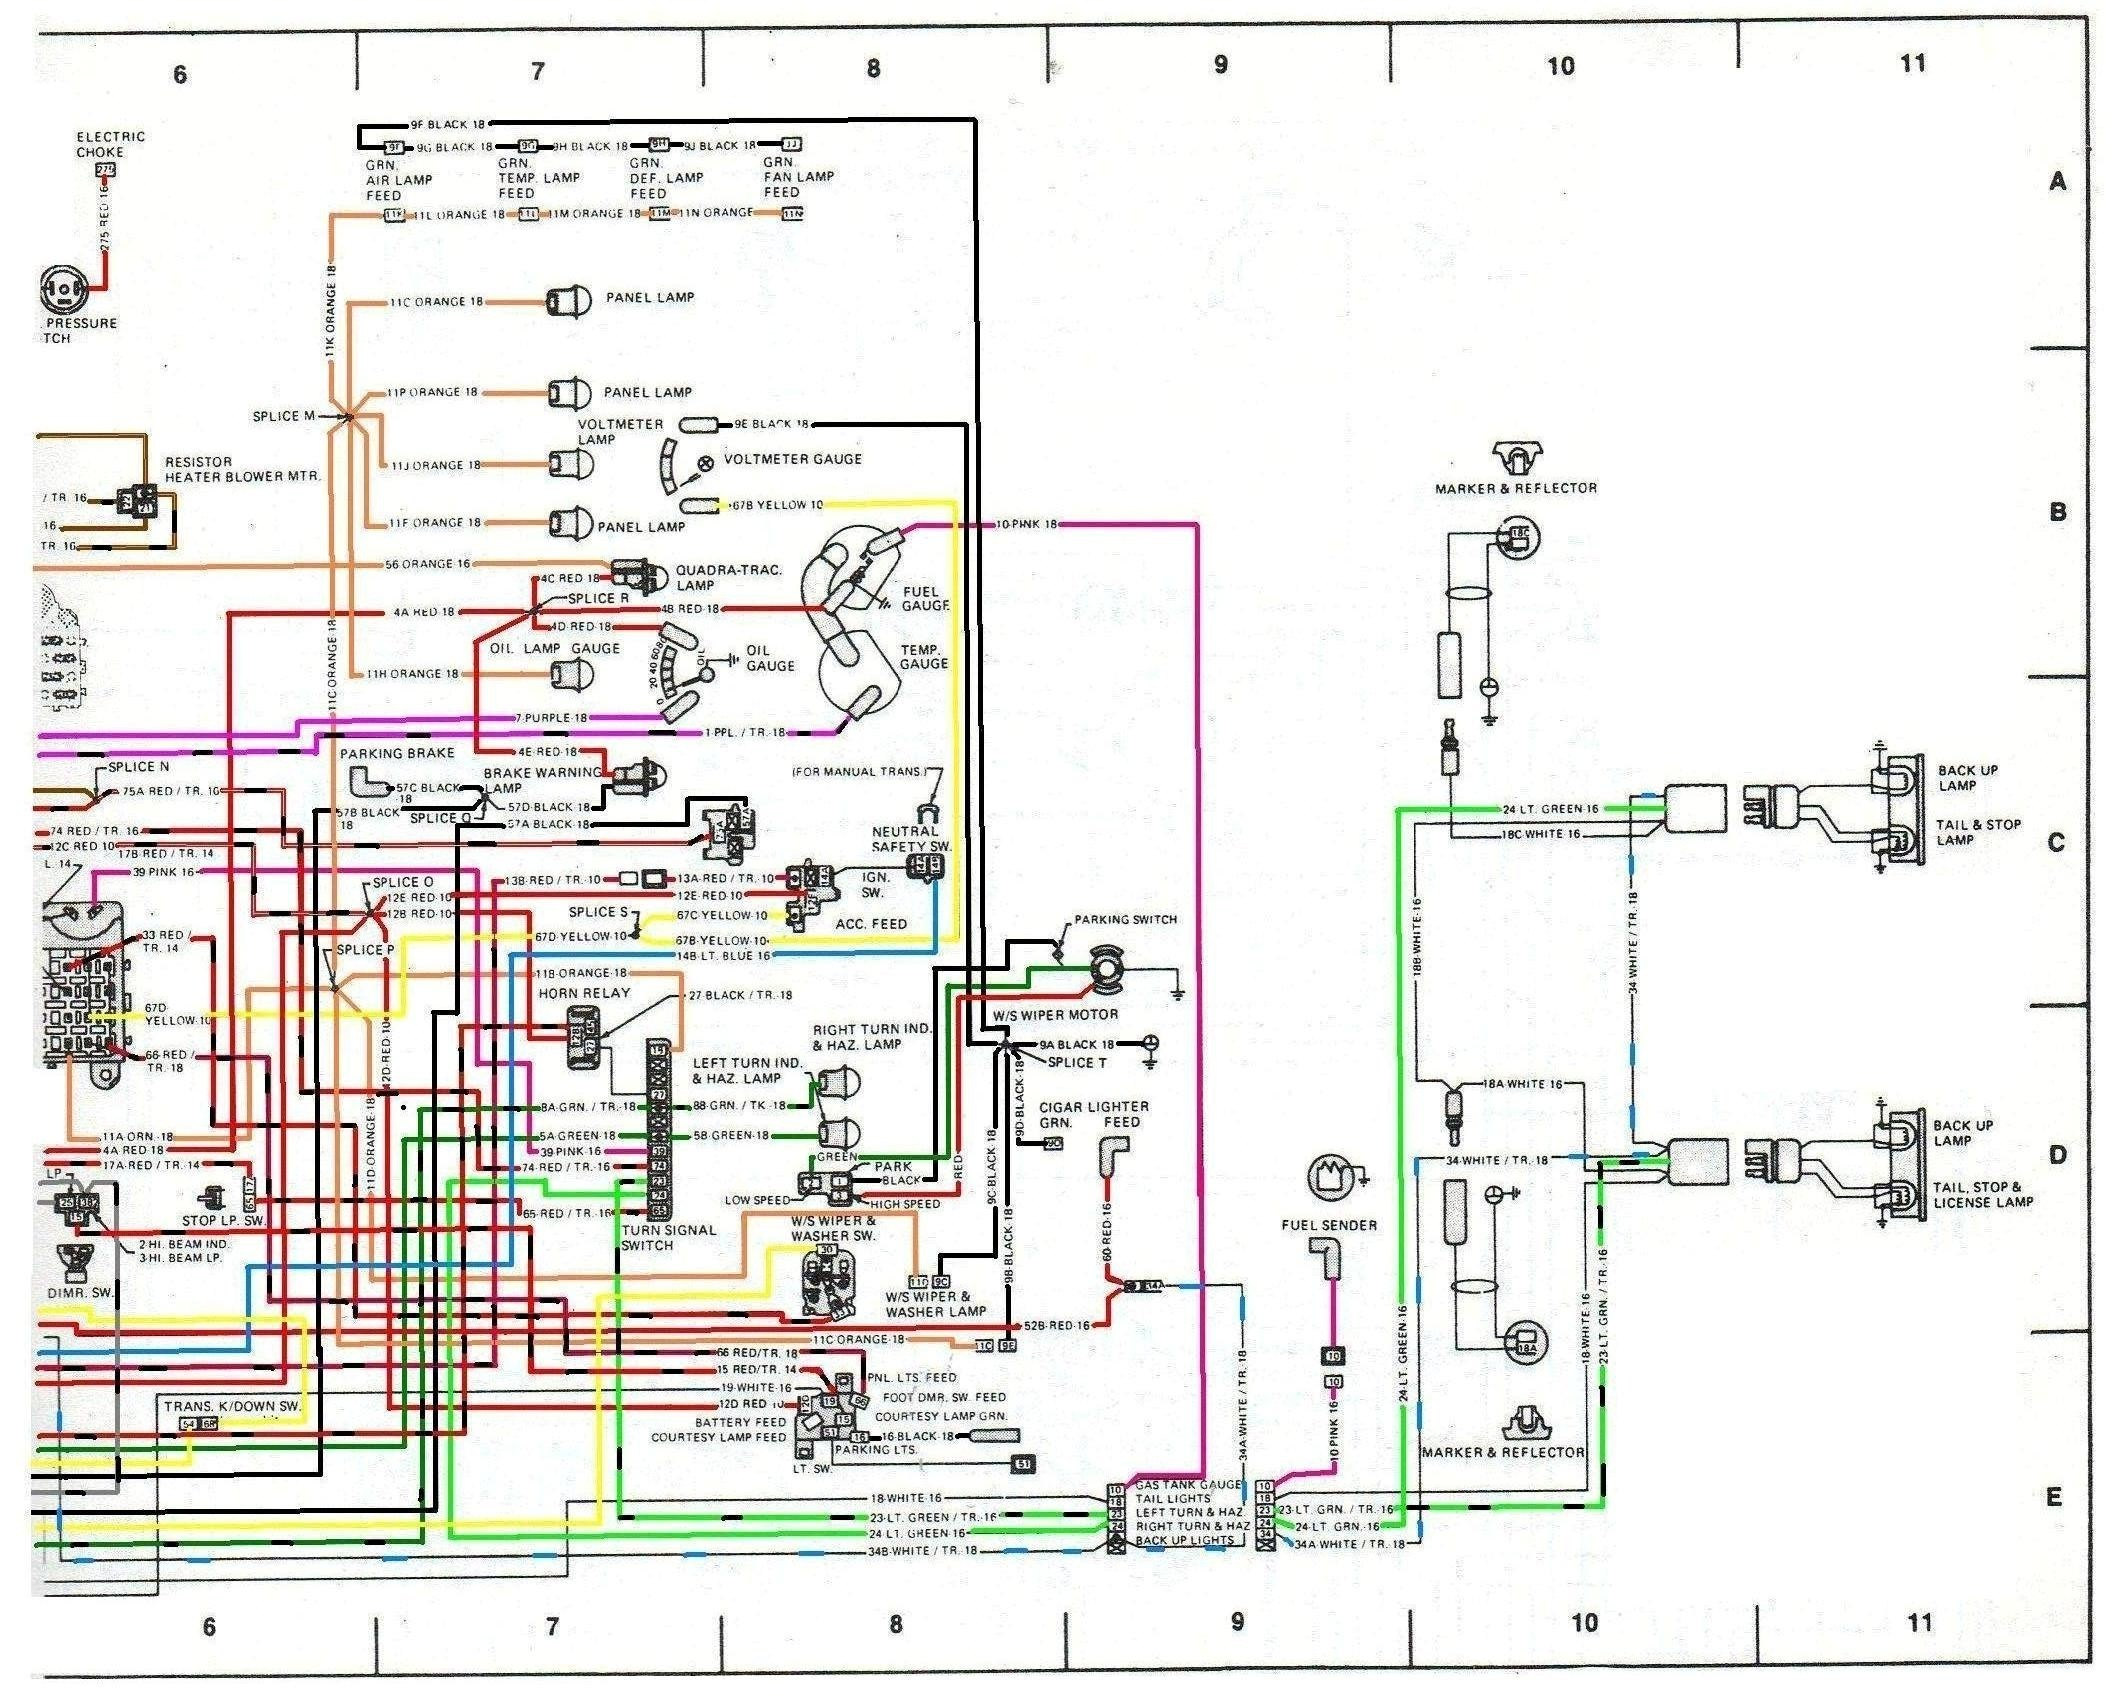 VN_1012] 94 Jeep Wrangler Brake Light Wiring Diagram Wiring DiagramSianu Verr Verr Acion Inoma Ultr Xeira Mohammedshrine Librar Wiring 101